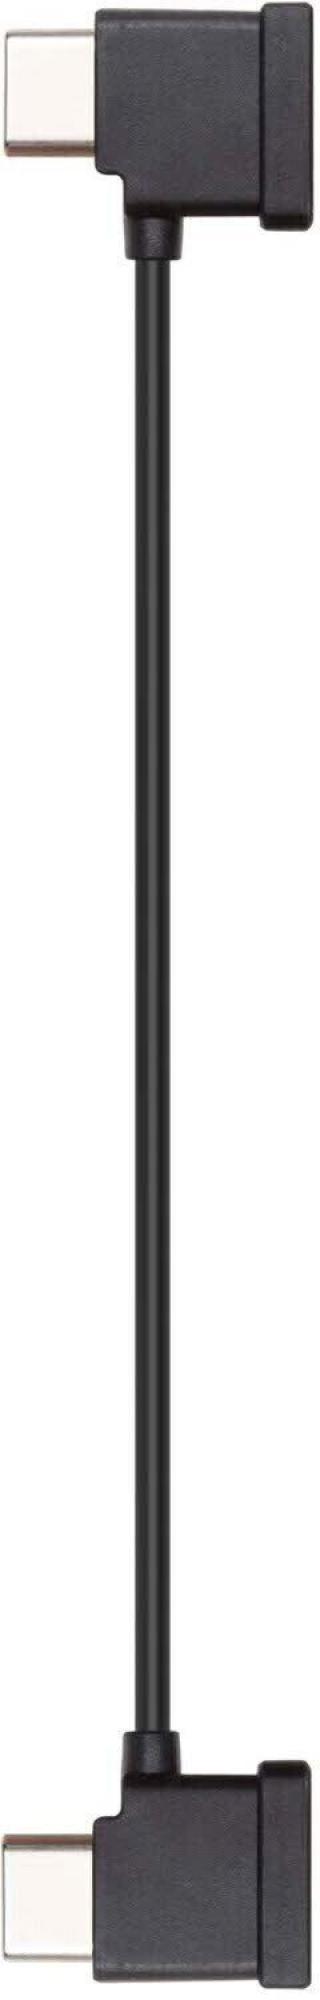 DJI Mavic RC Cable Type-C connector - DJIM0250-10